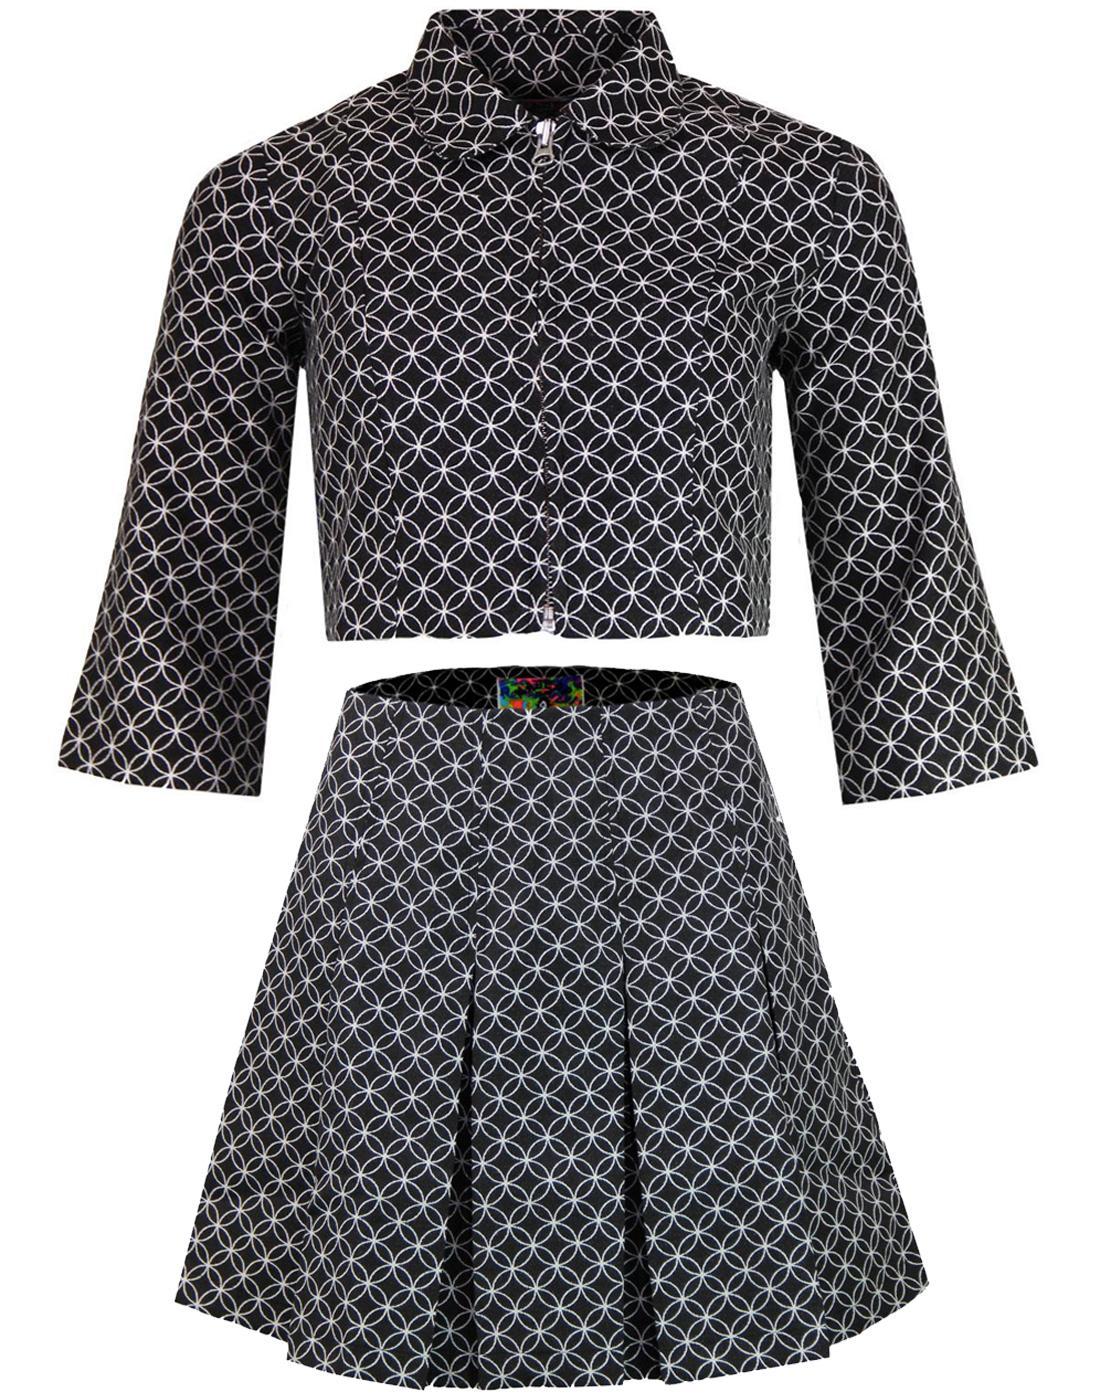 Bijoux MADCAP ENGLAND Bolero Jacket & Skirt Suit